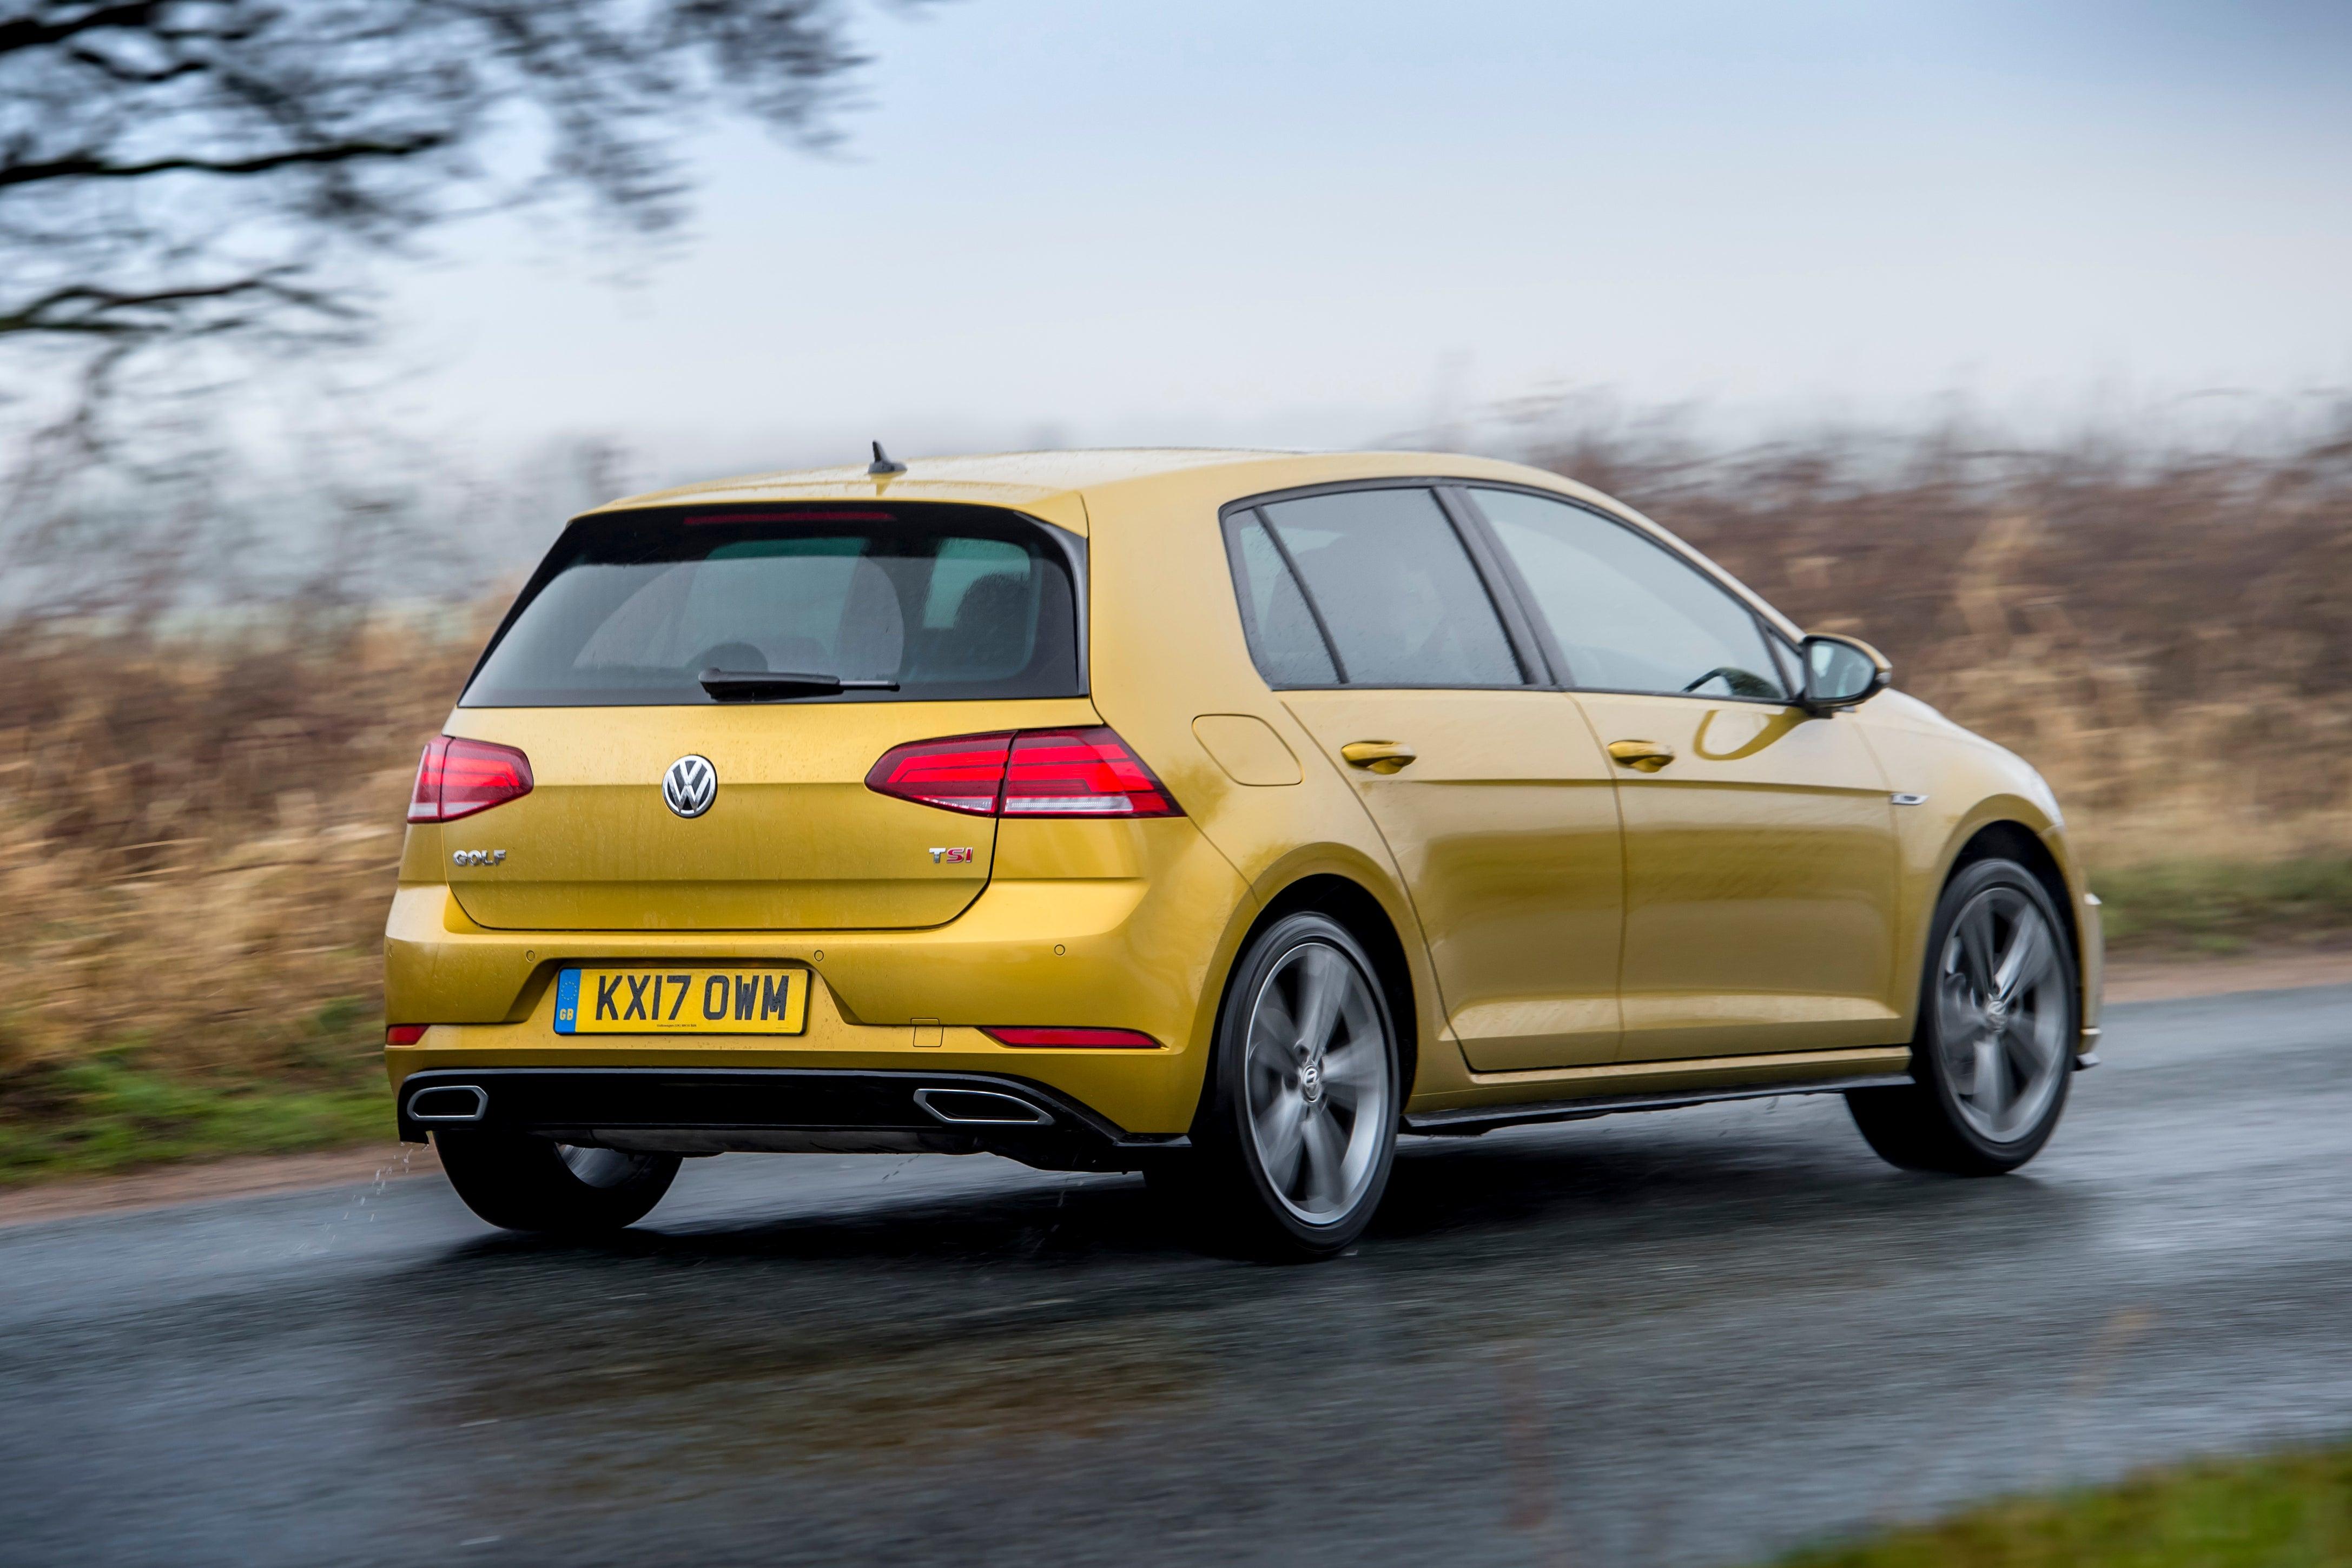 Volkswagen Golf Rear Side View